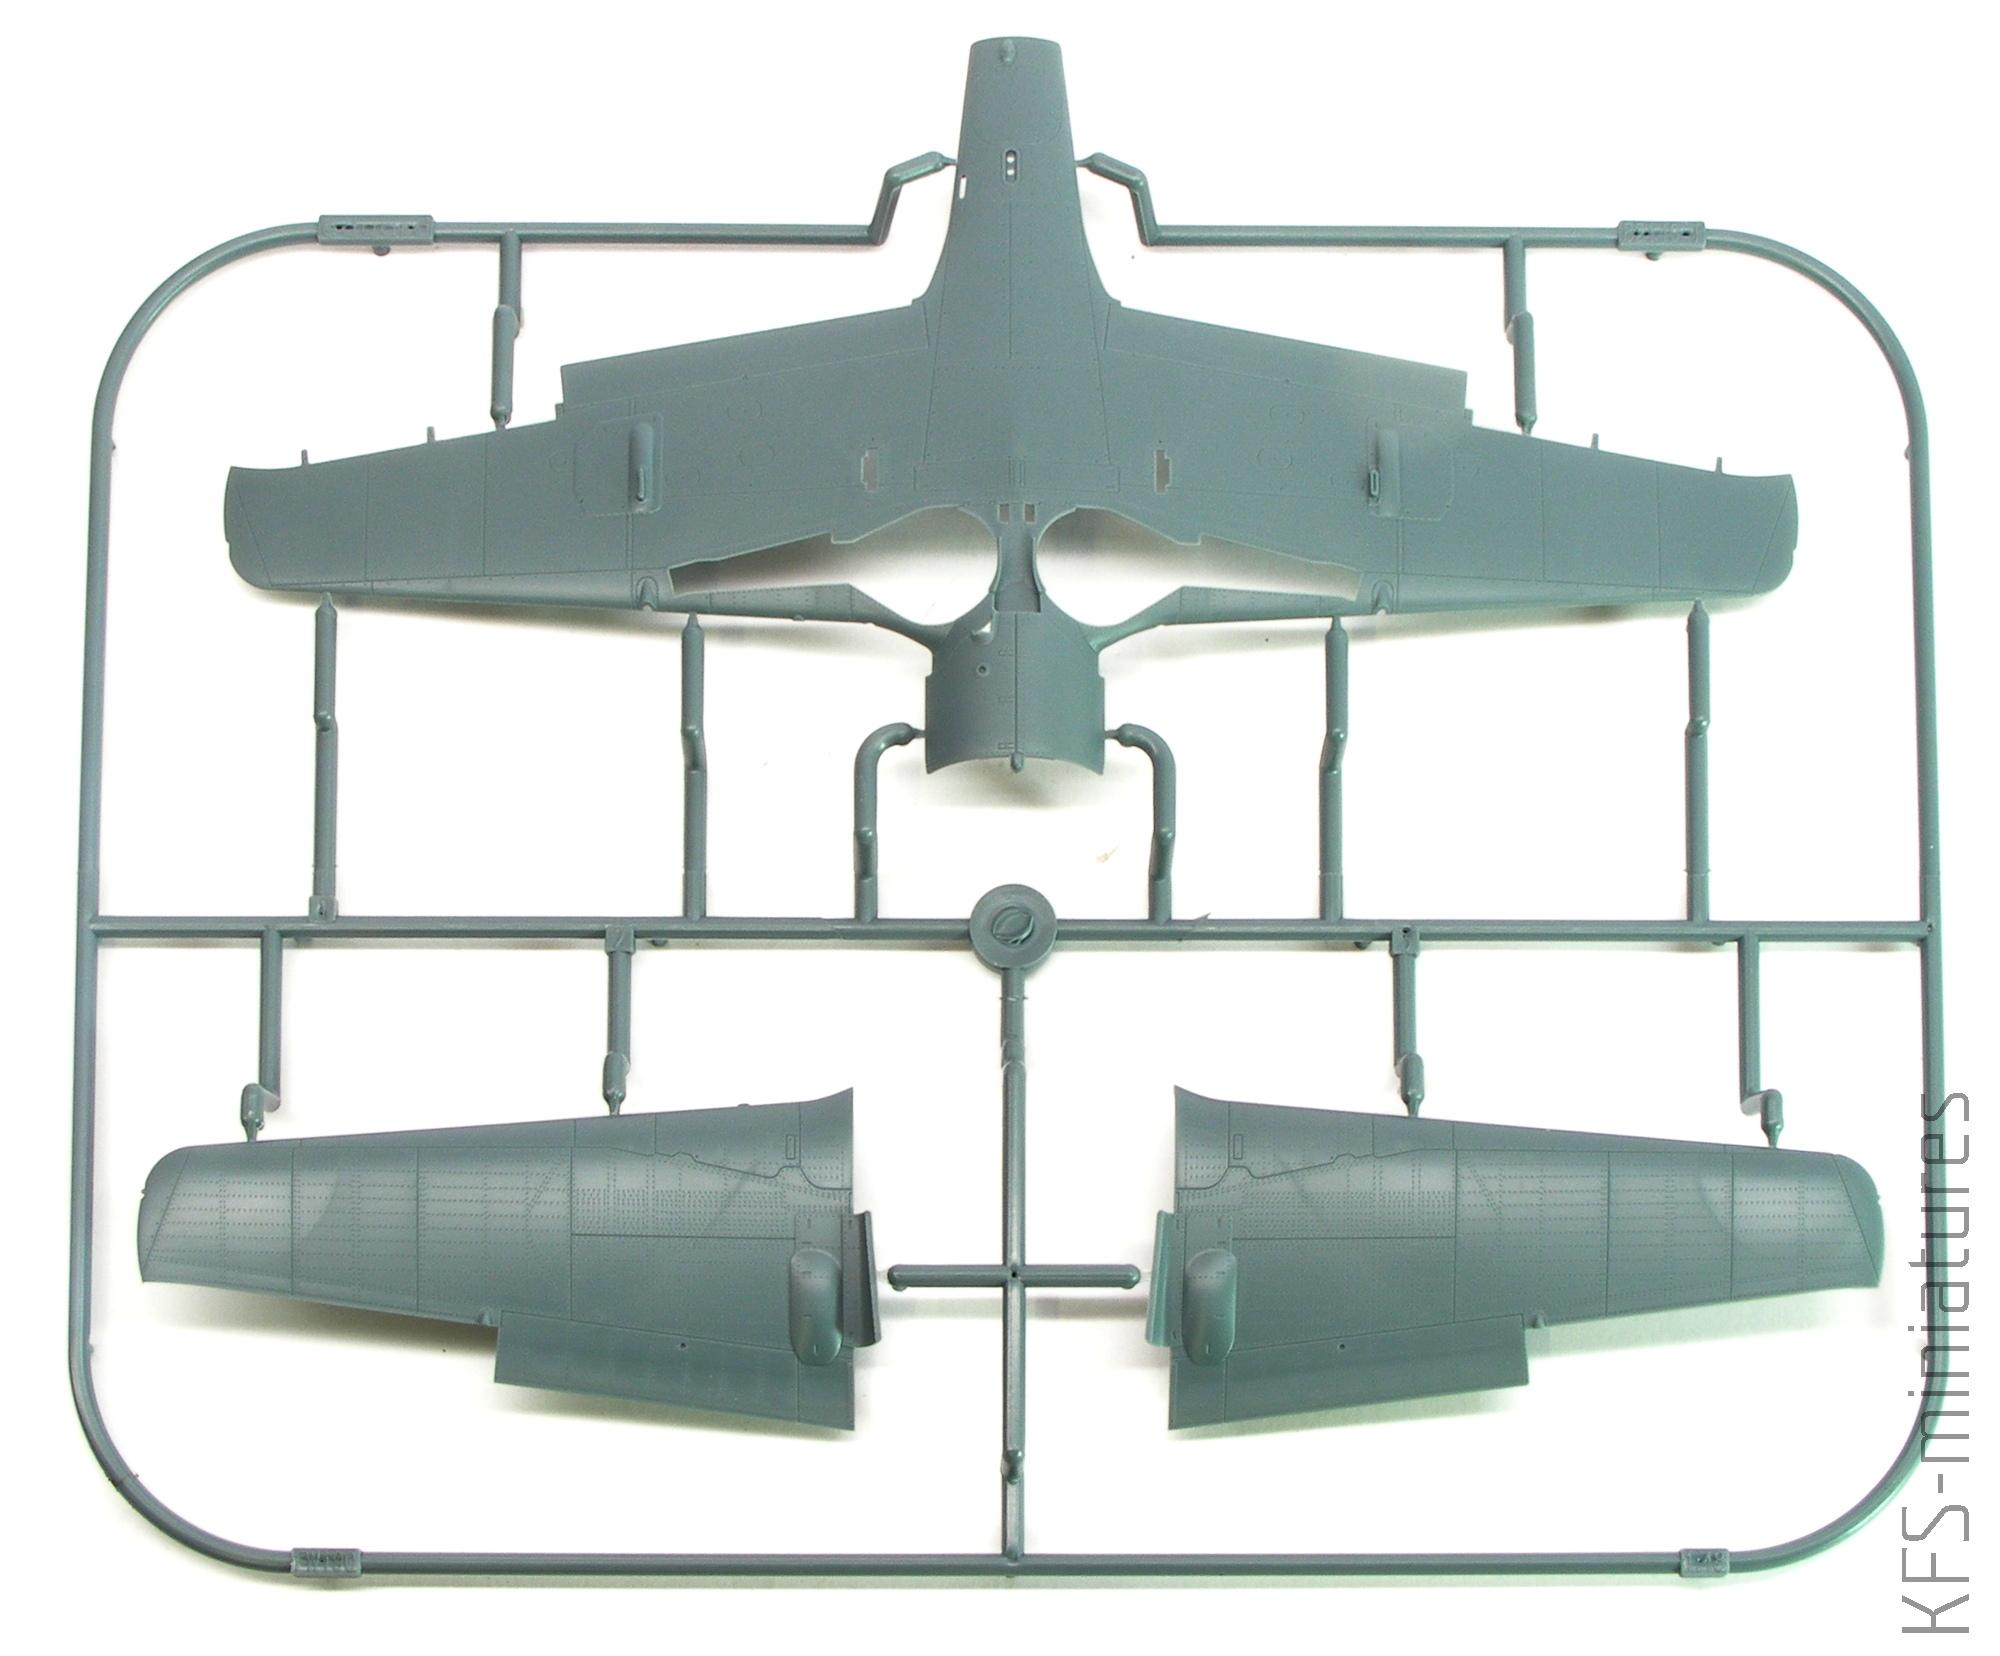 1/48 Fw 190 A-8 - EDUARD